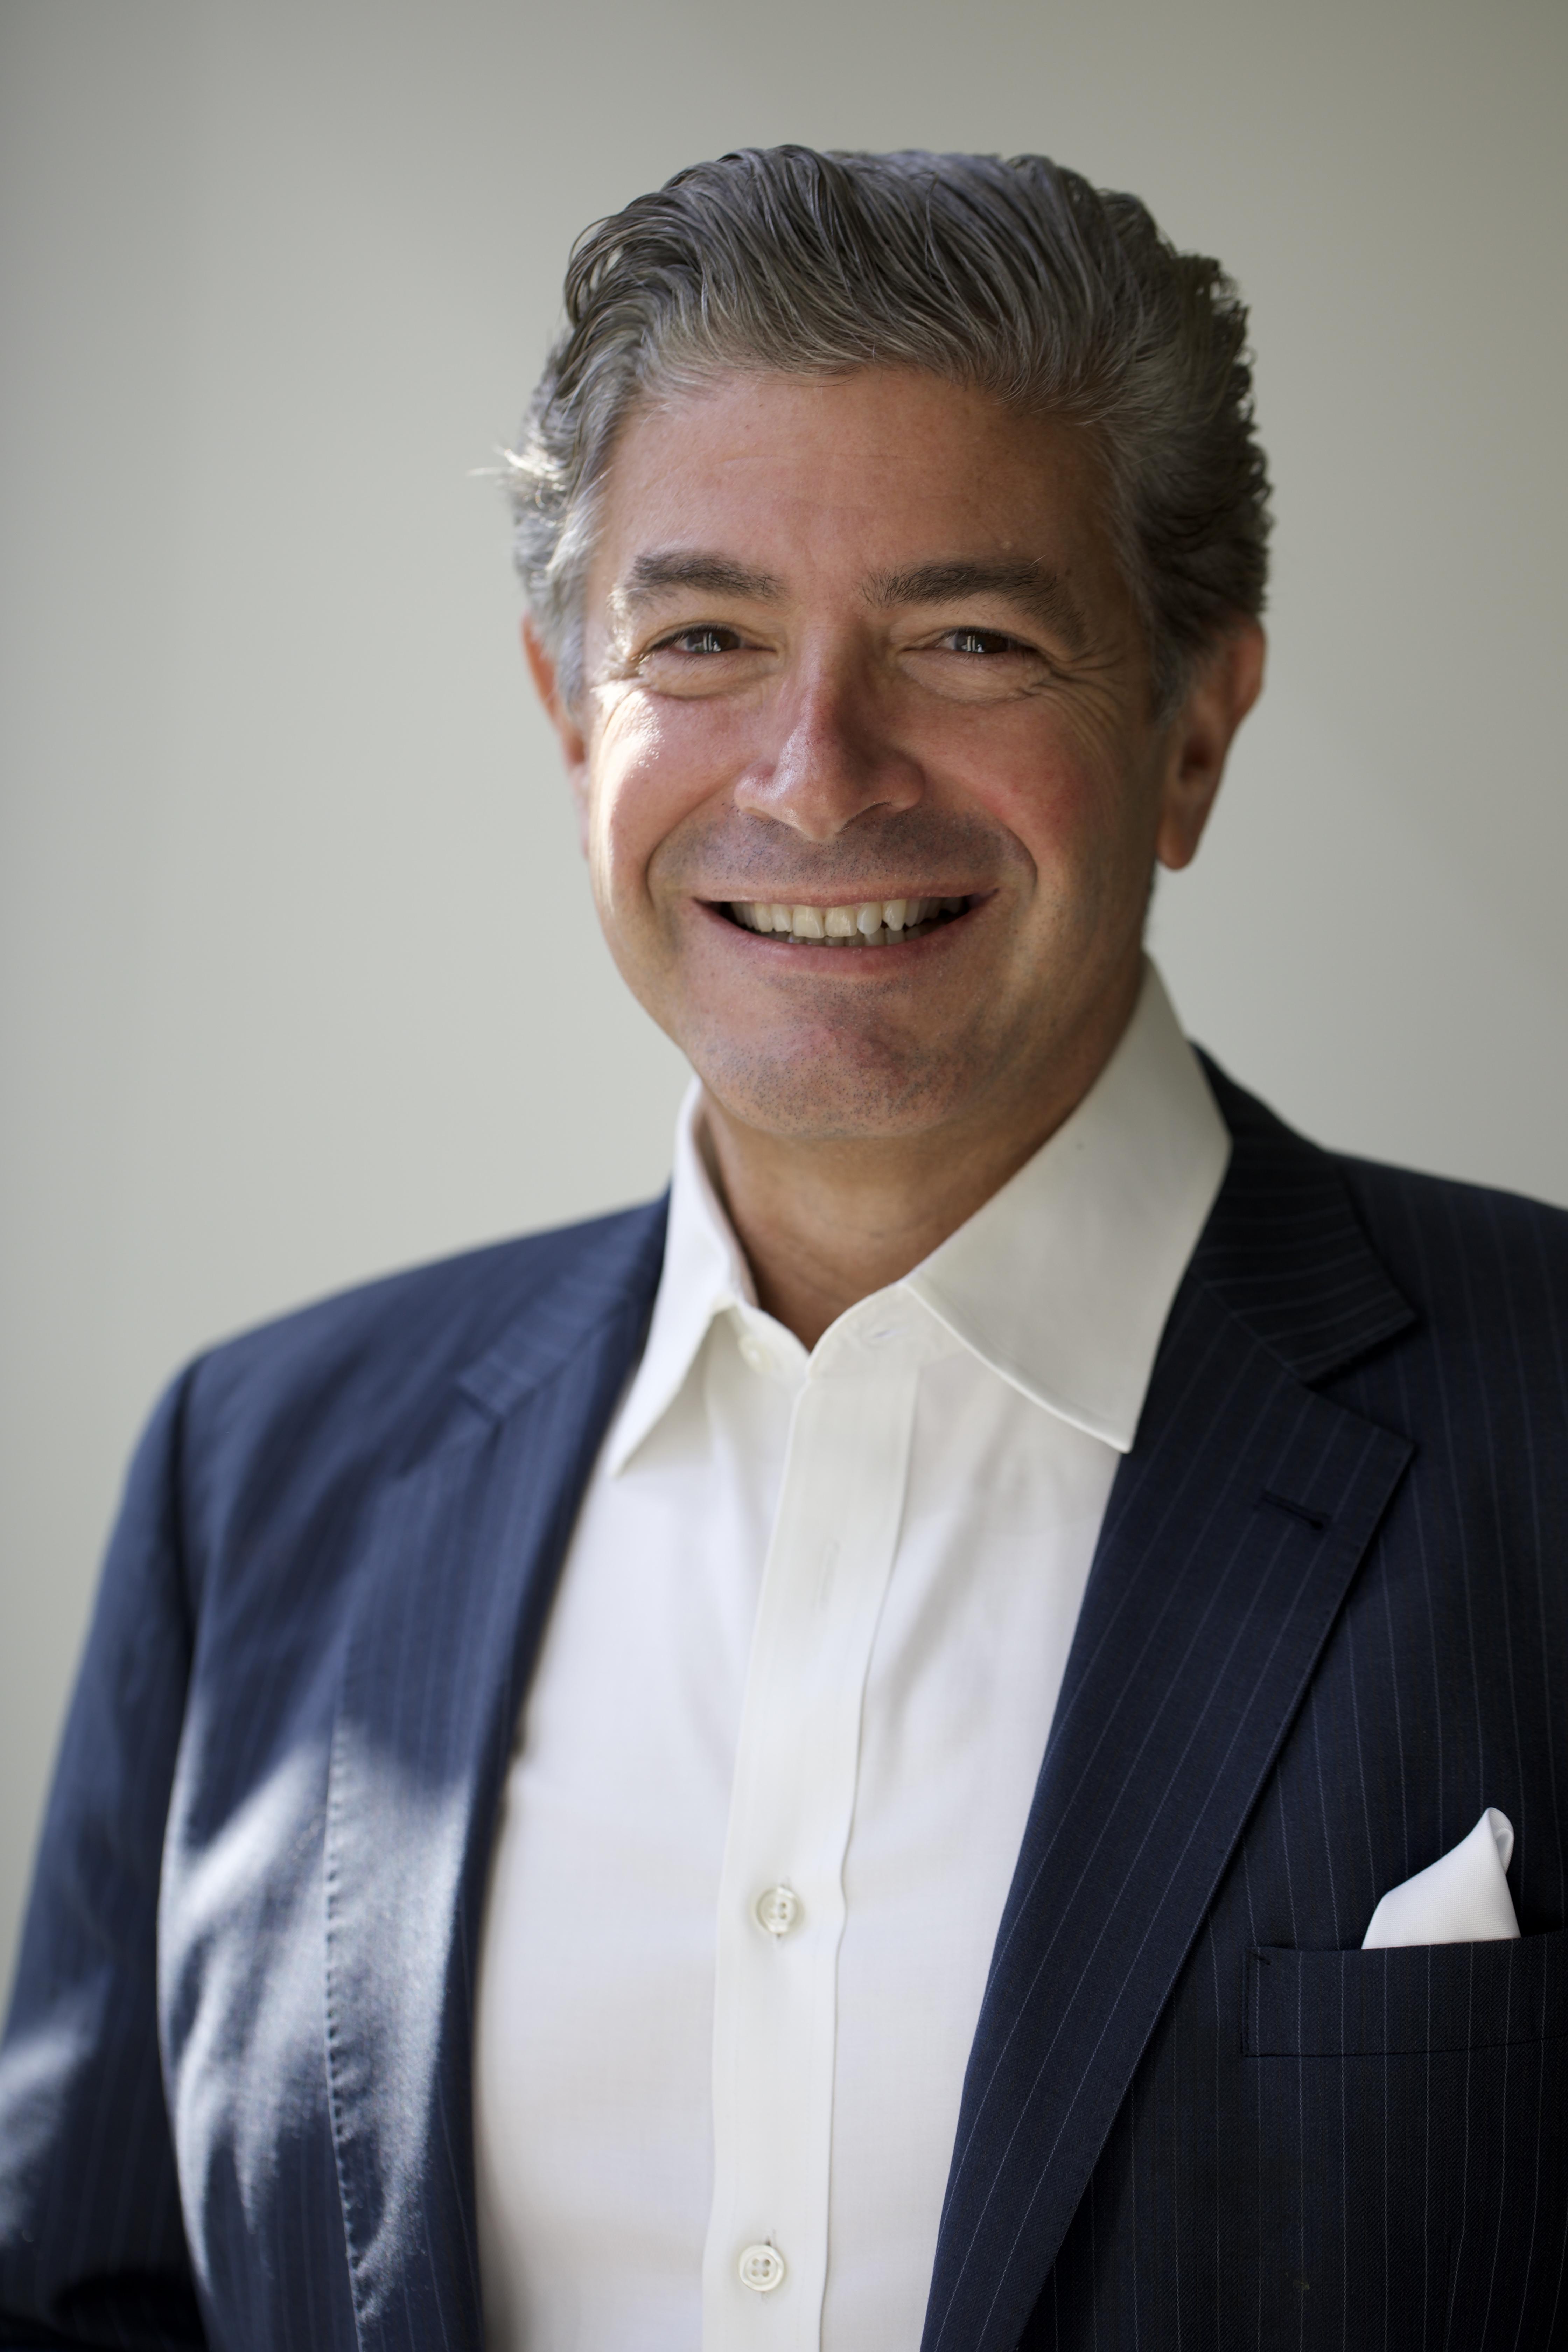 Joseph Armato Establishes Leadership Position with $45 Million Plus Property Portfolio